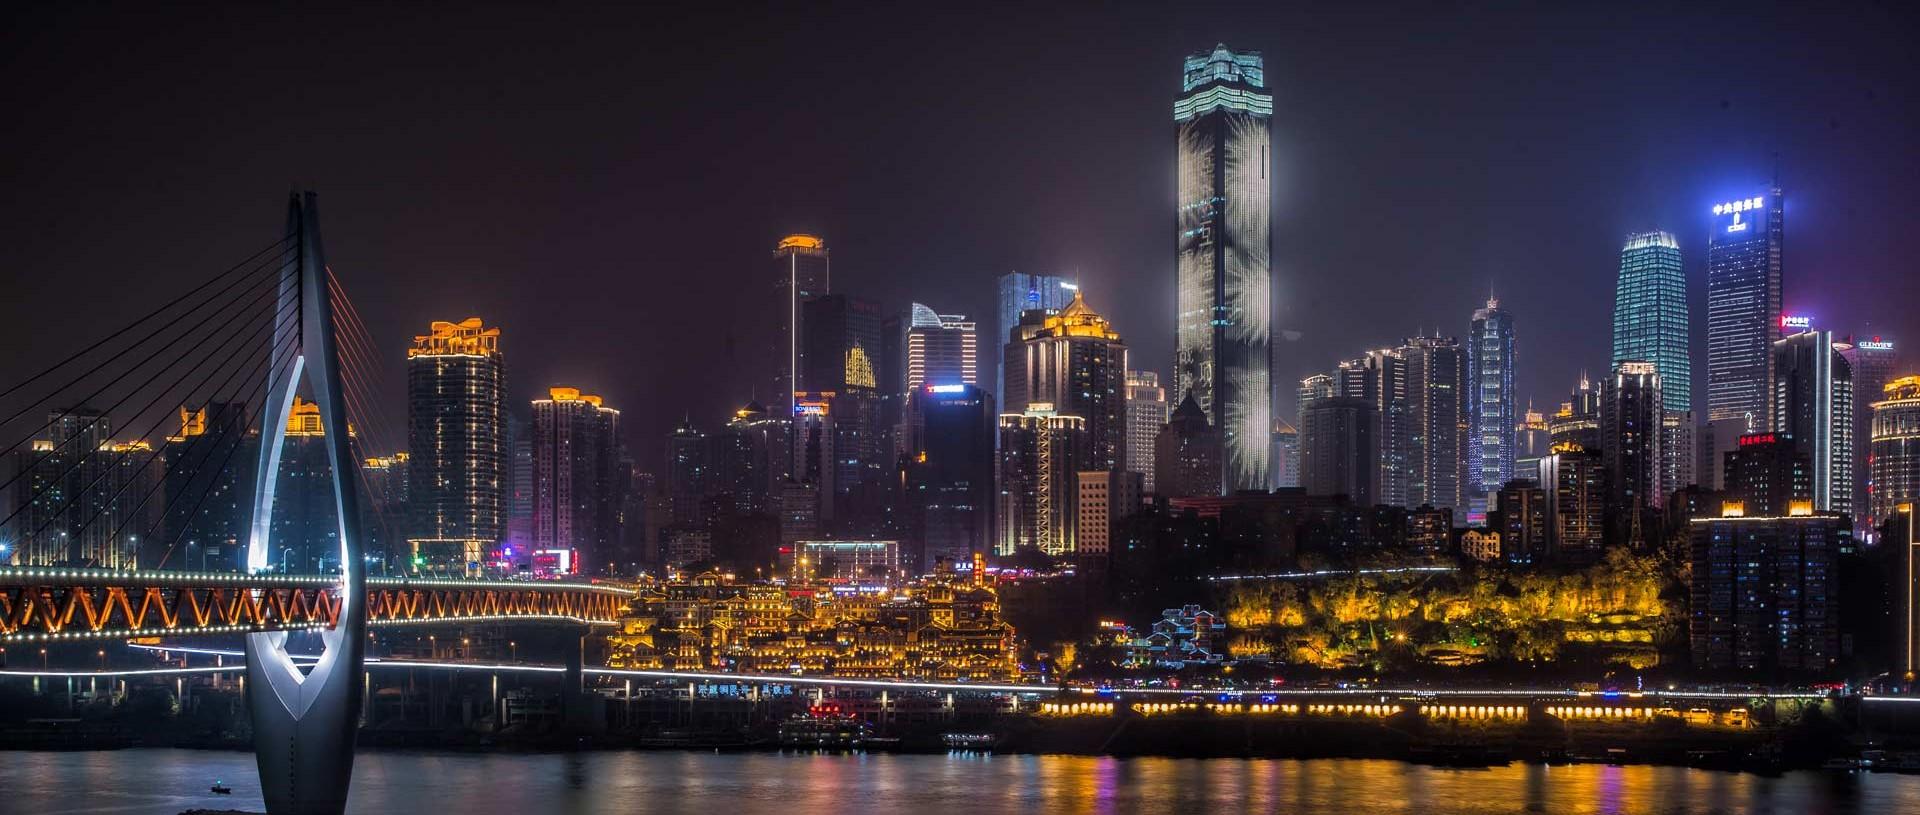 regent-chongqing-destination-mh-y